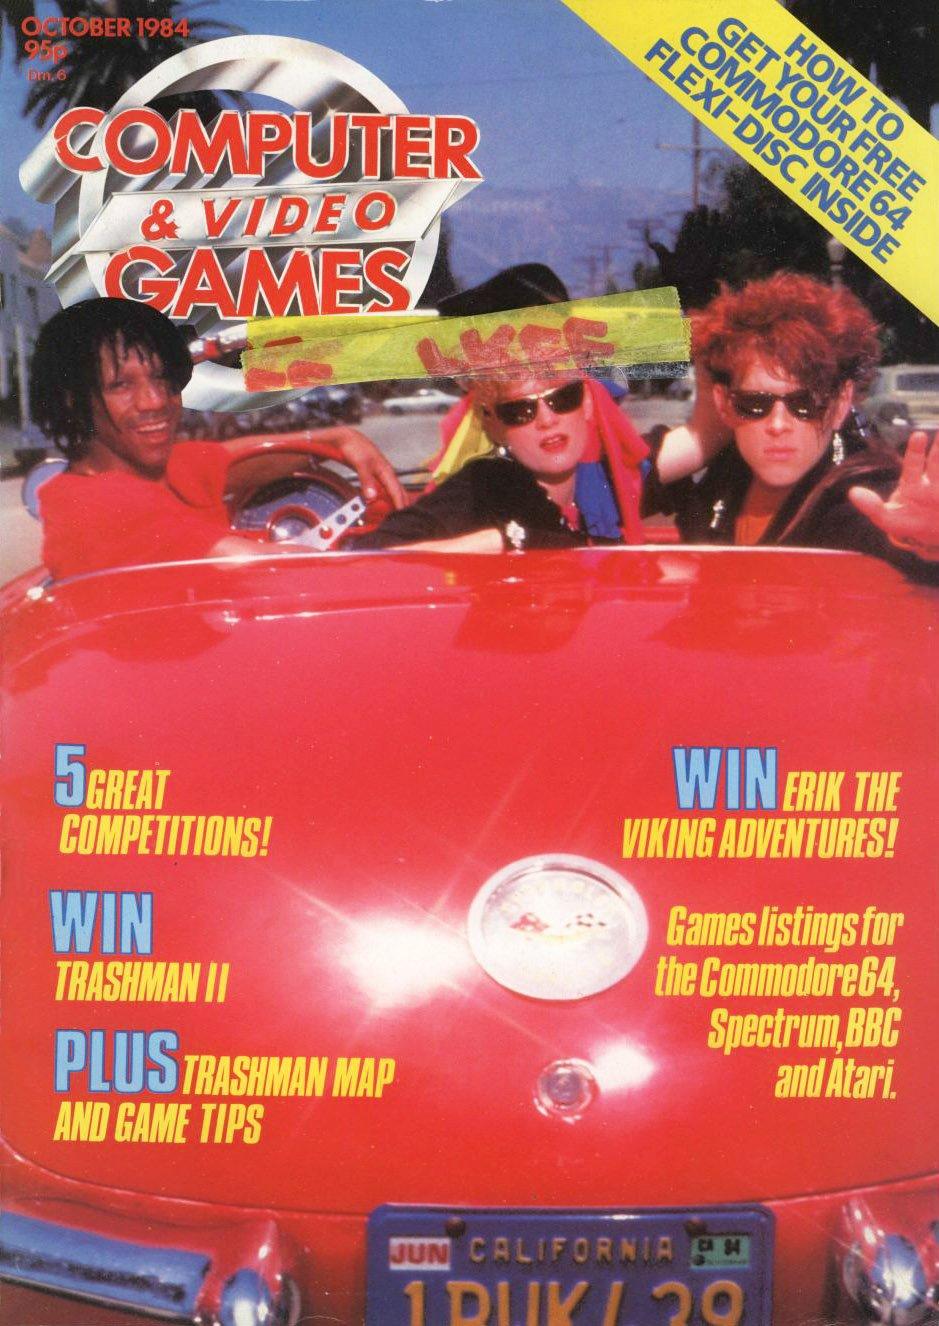 Computer & Video Games 036 (October 1984)